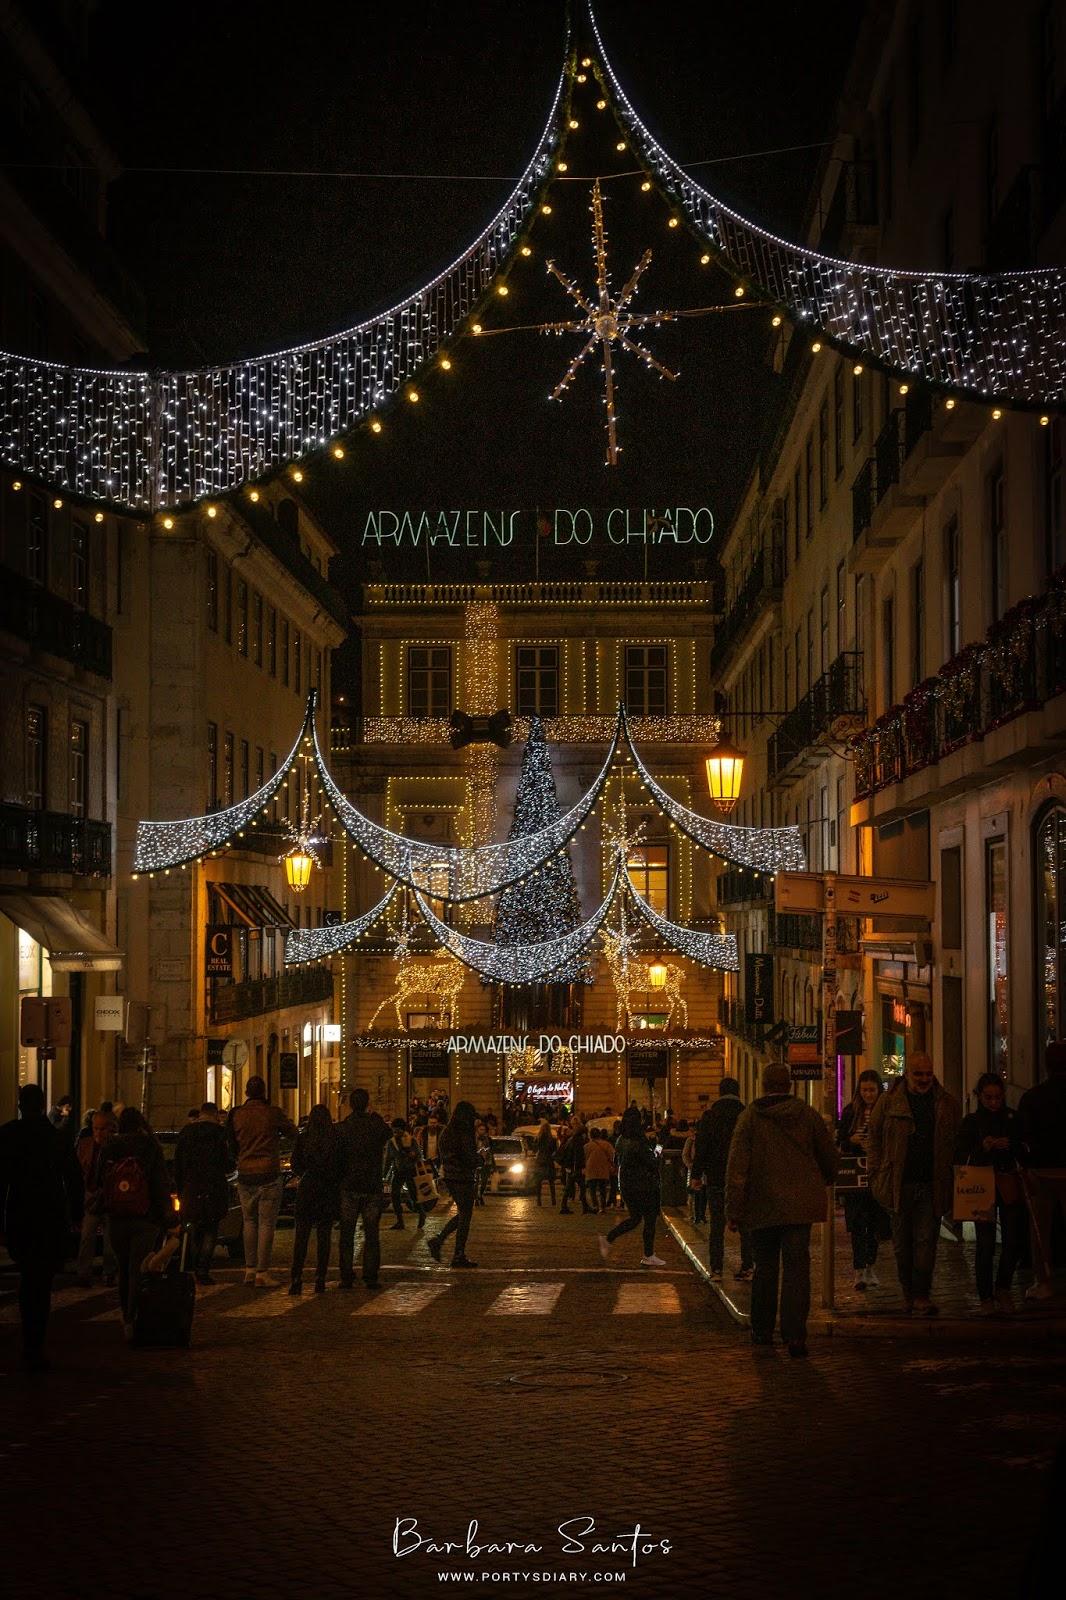 Chiado - Christmas Decorations in Lisbon